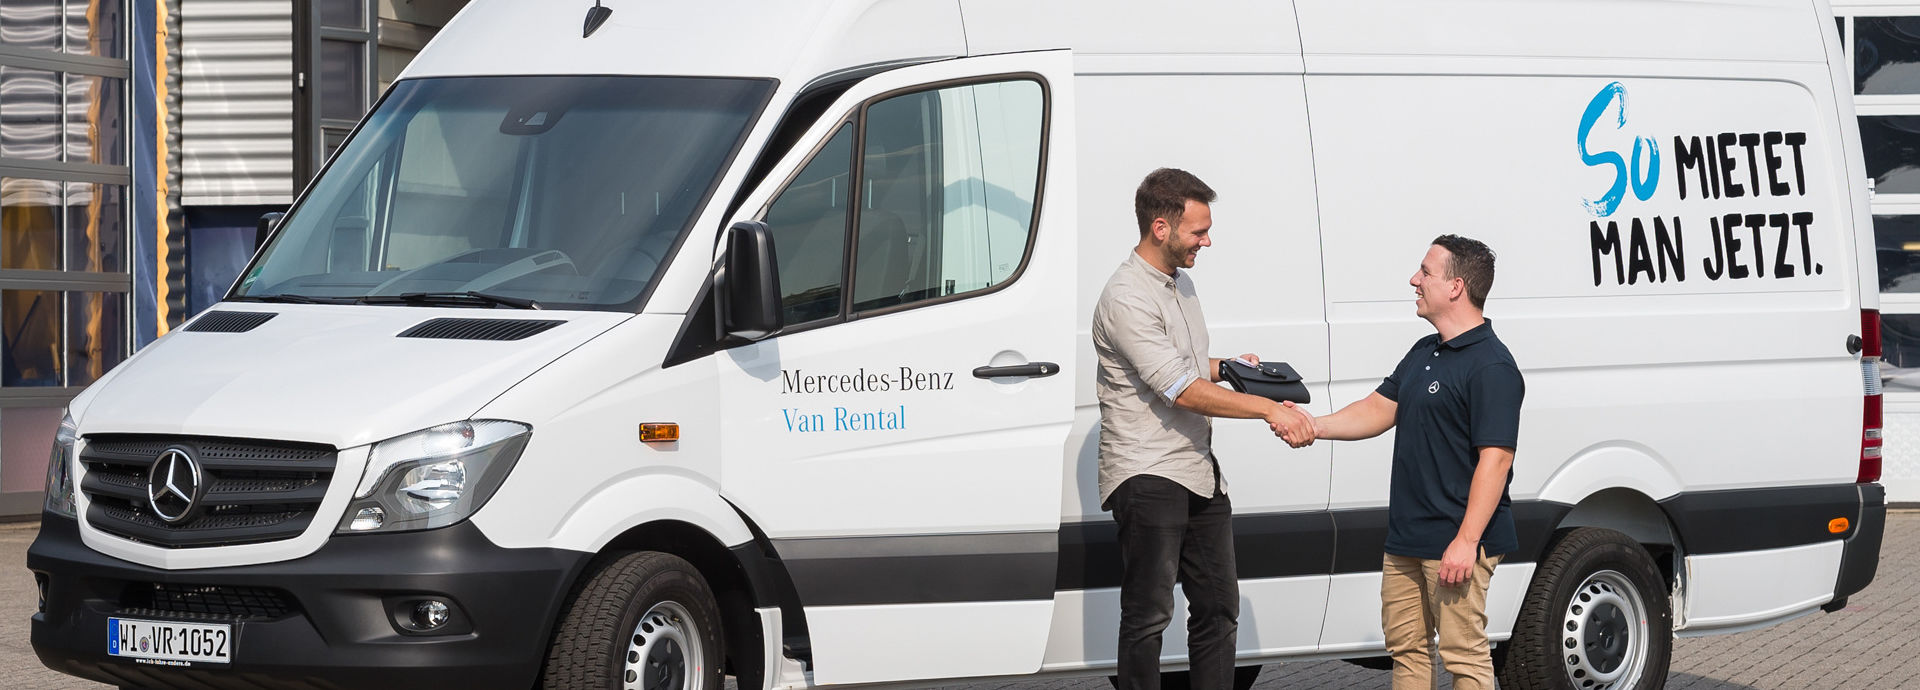 transporter mieten mainz trendy free transporter mieten bild with transporter mieten bauhaus. Black Bedroom Furniture Sets. Home Design Ideas